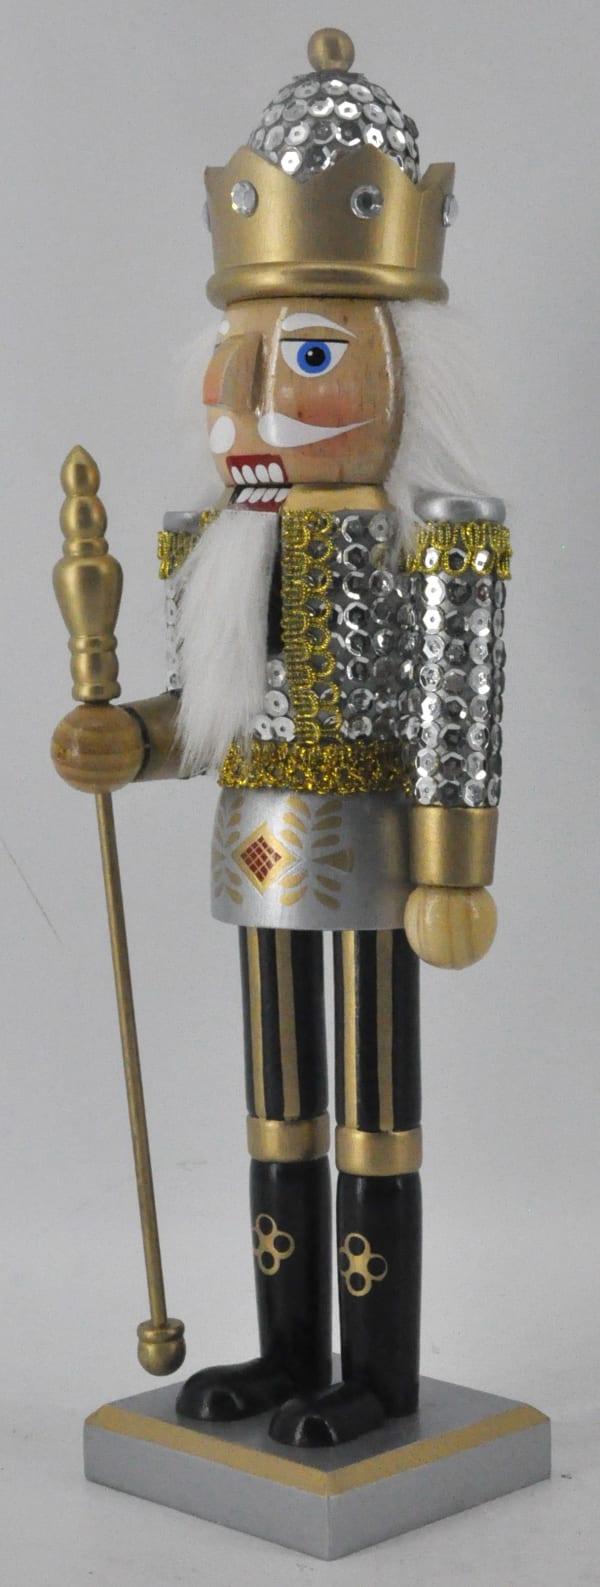 Silver Gold Sequin Soldier Nutcracker Pier 1